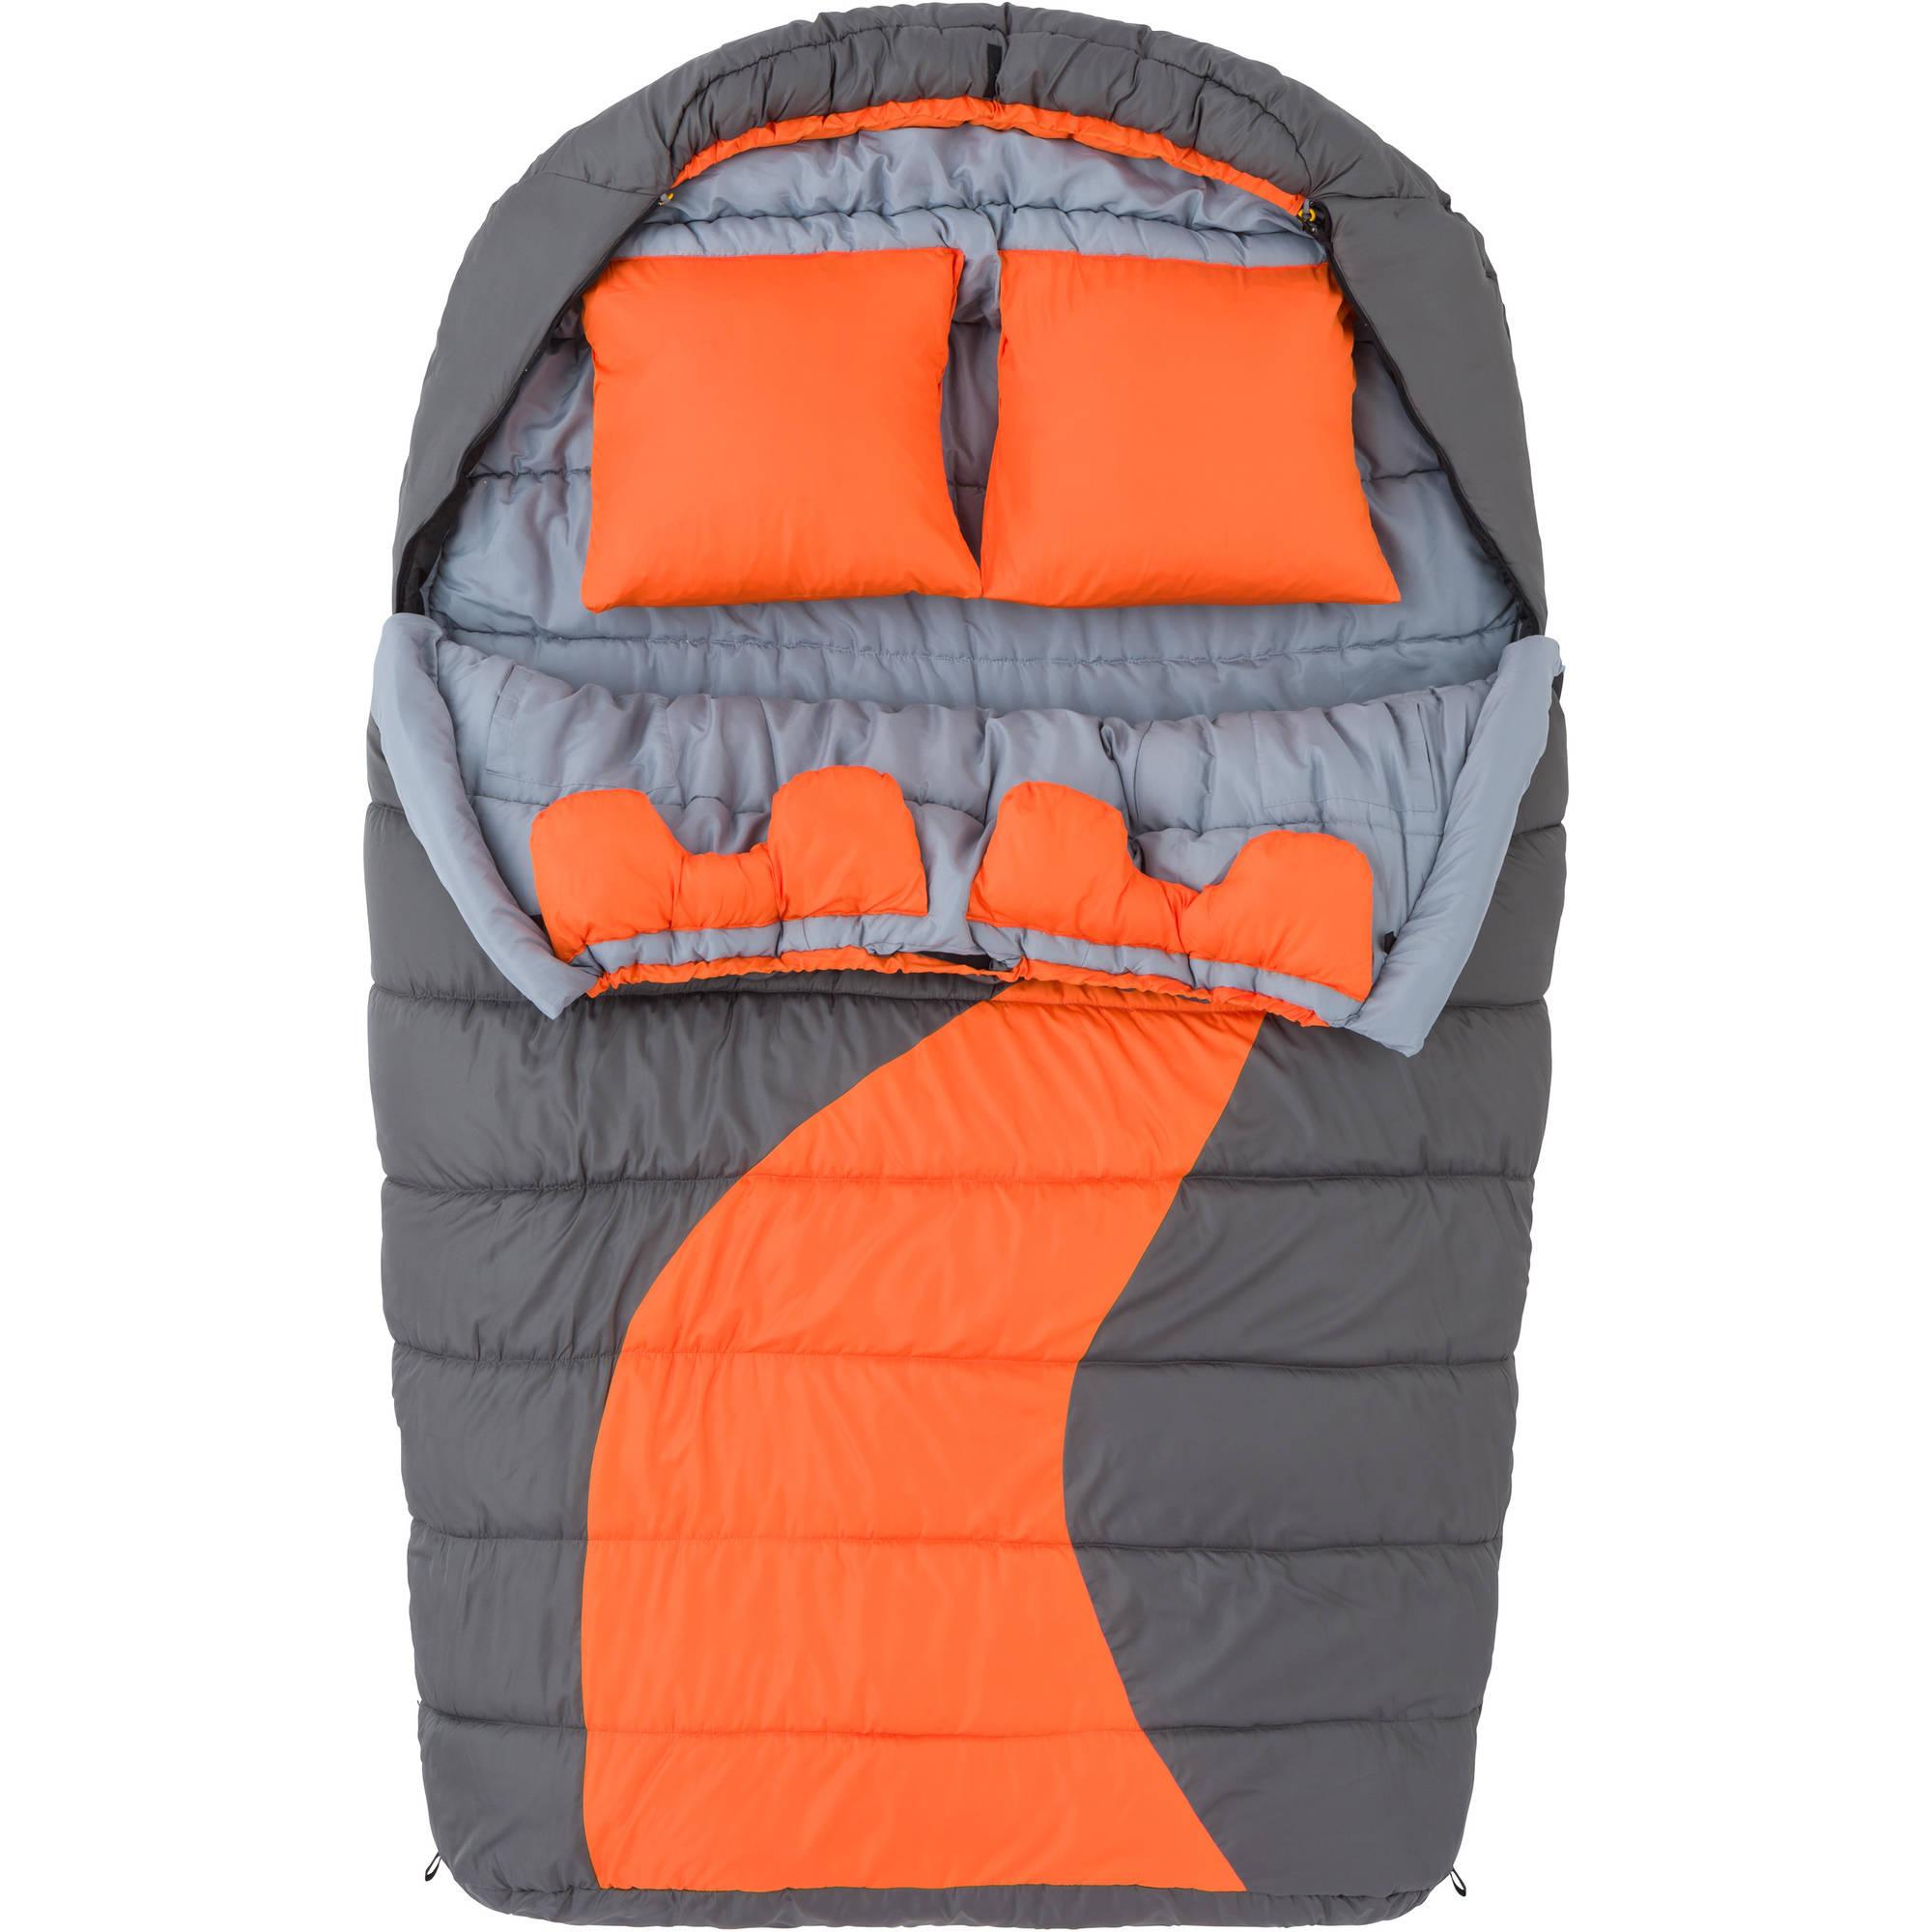 Ozark Trail 20F degree Cold Weather Double Mummy Sleeping ...